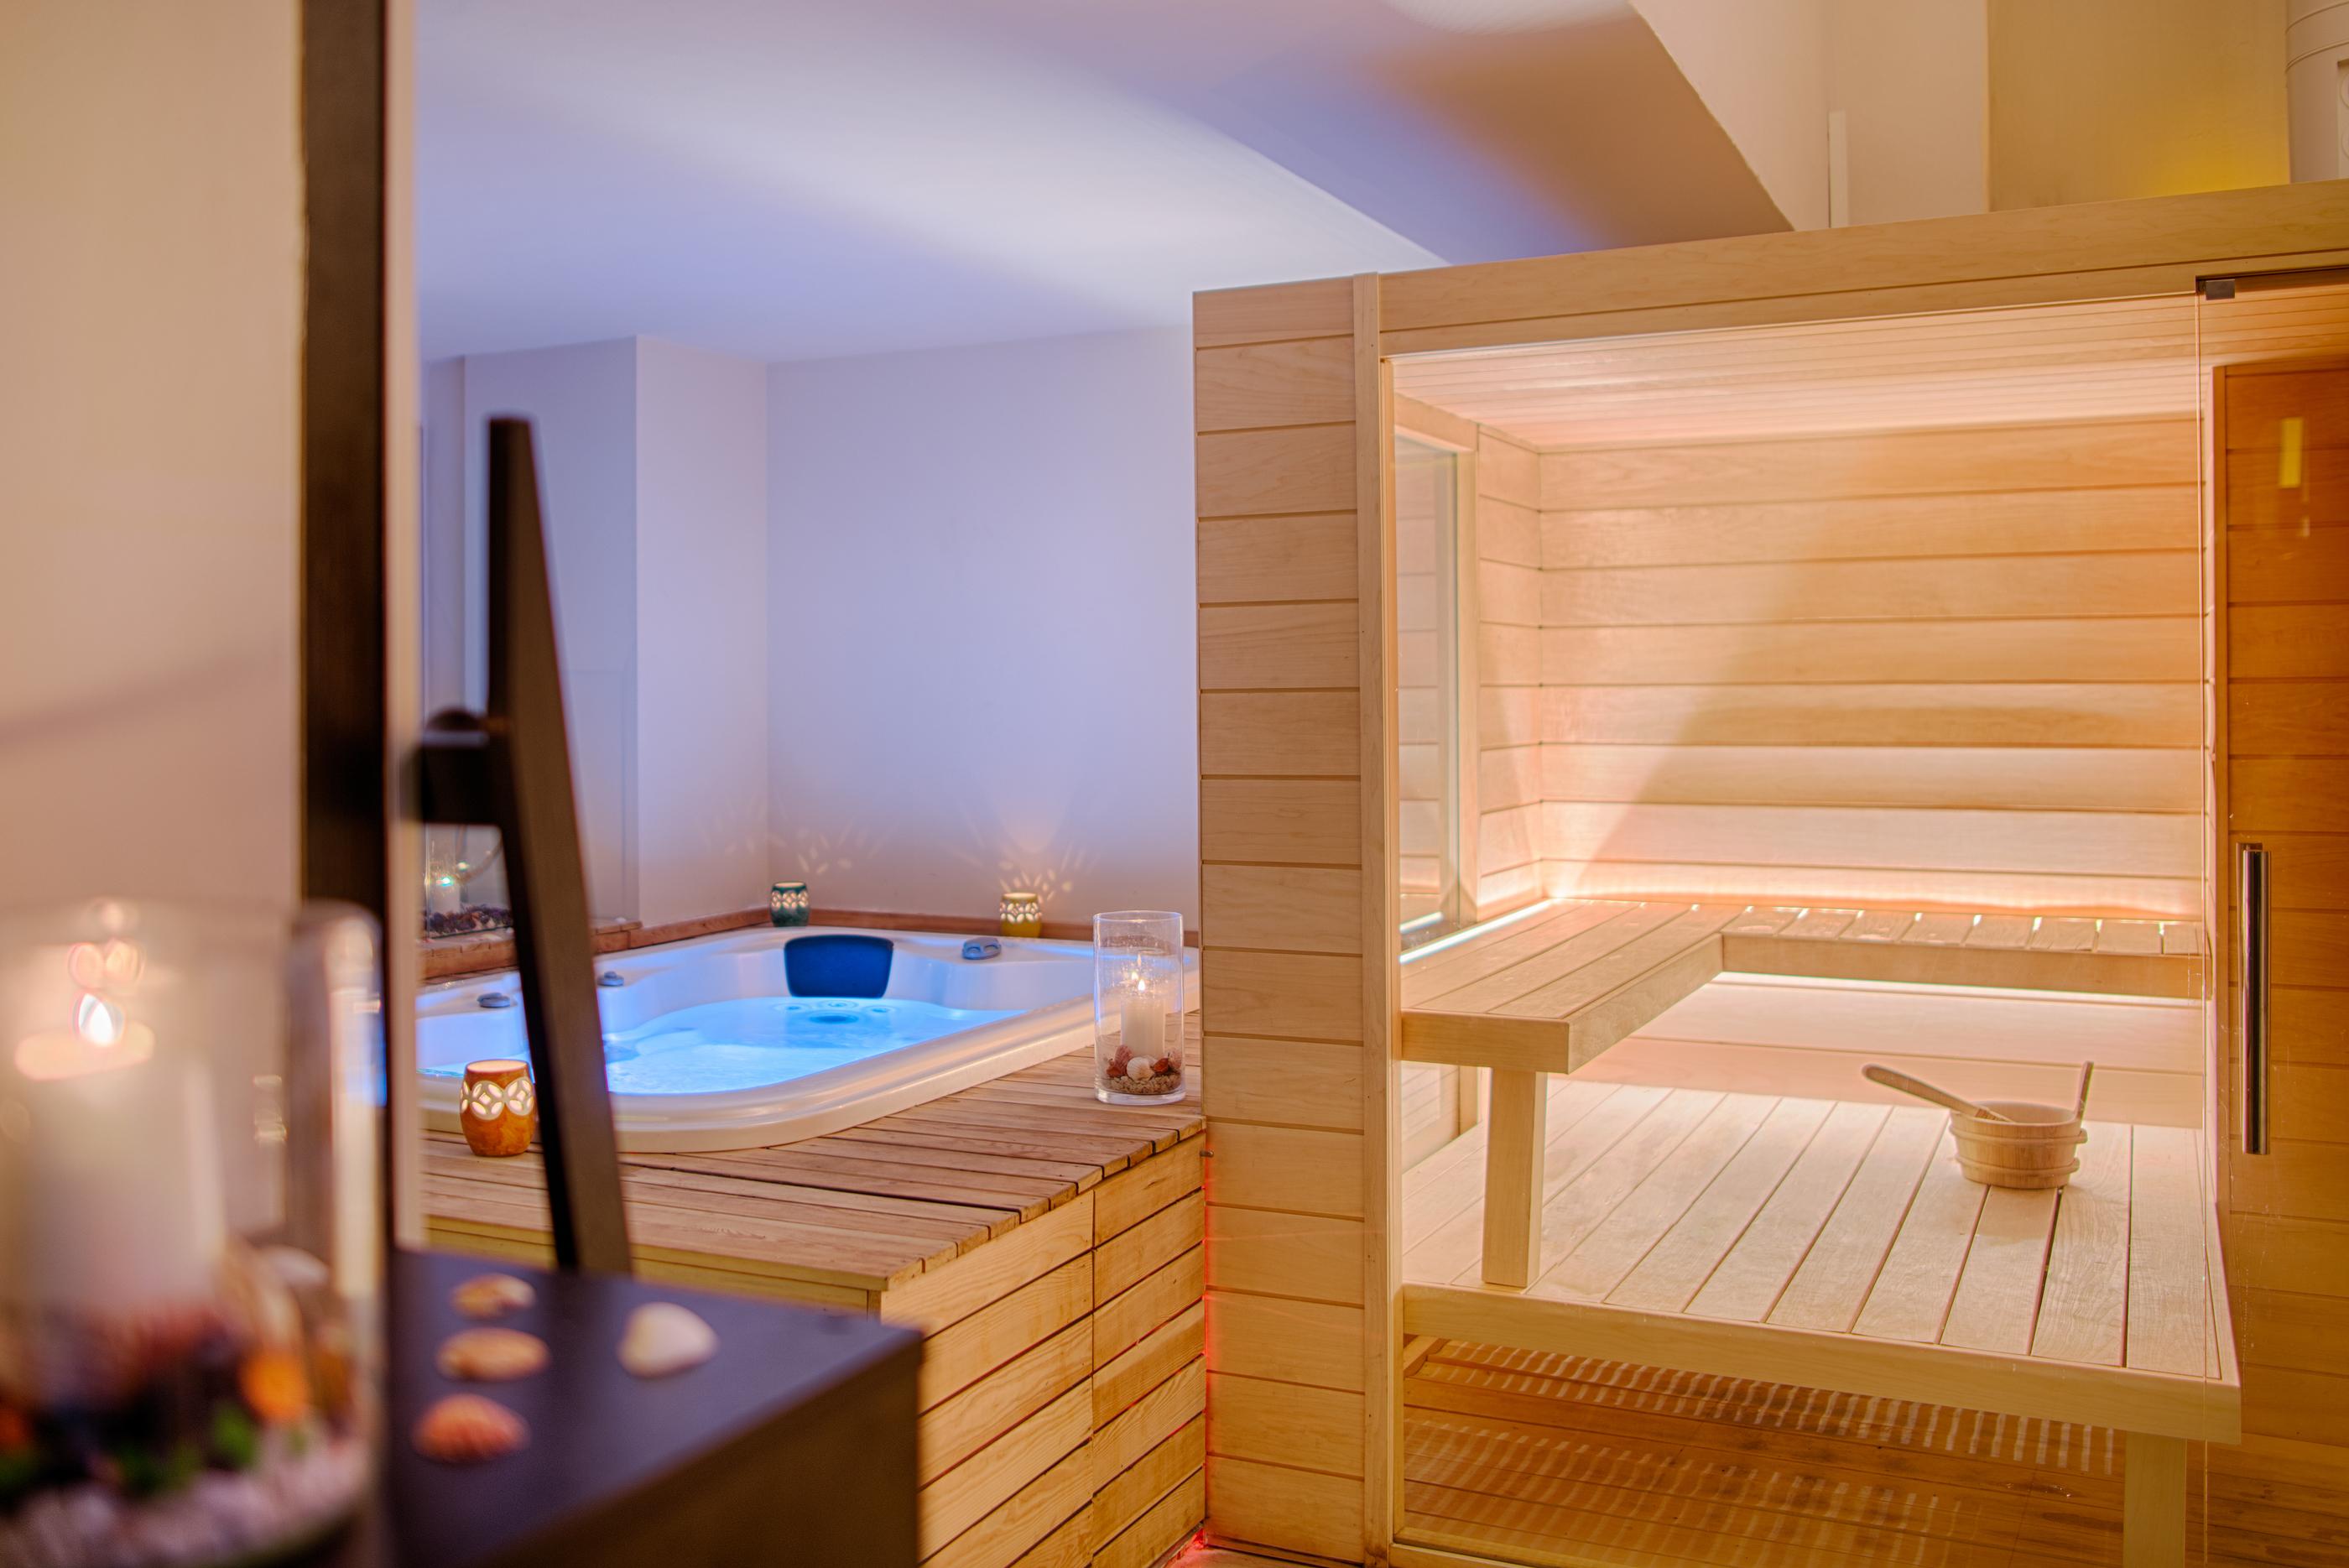 Bagno Turco Milano Prezzi.Home Amati Wellness Beauty Spa